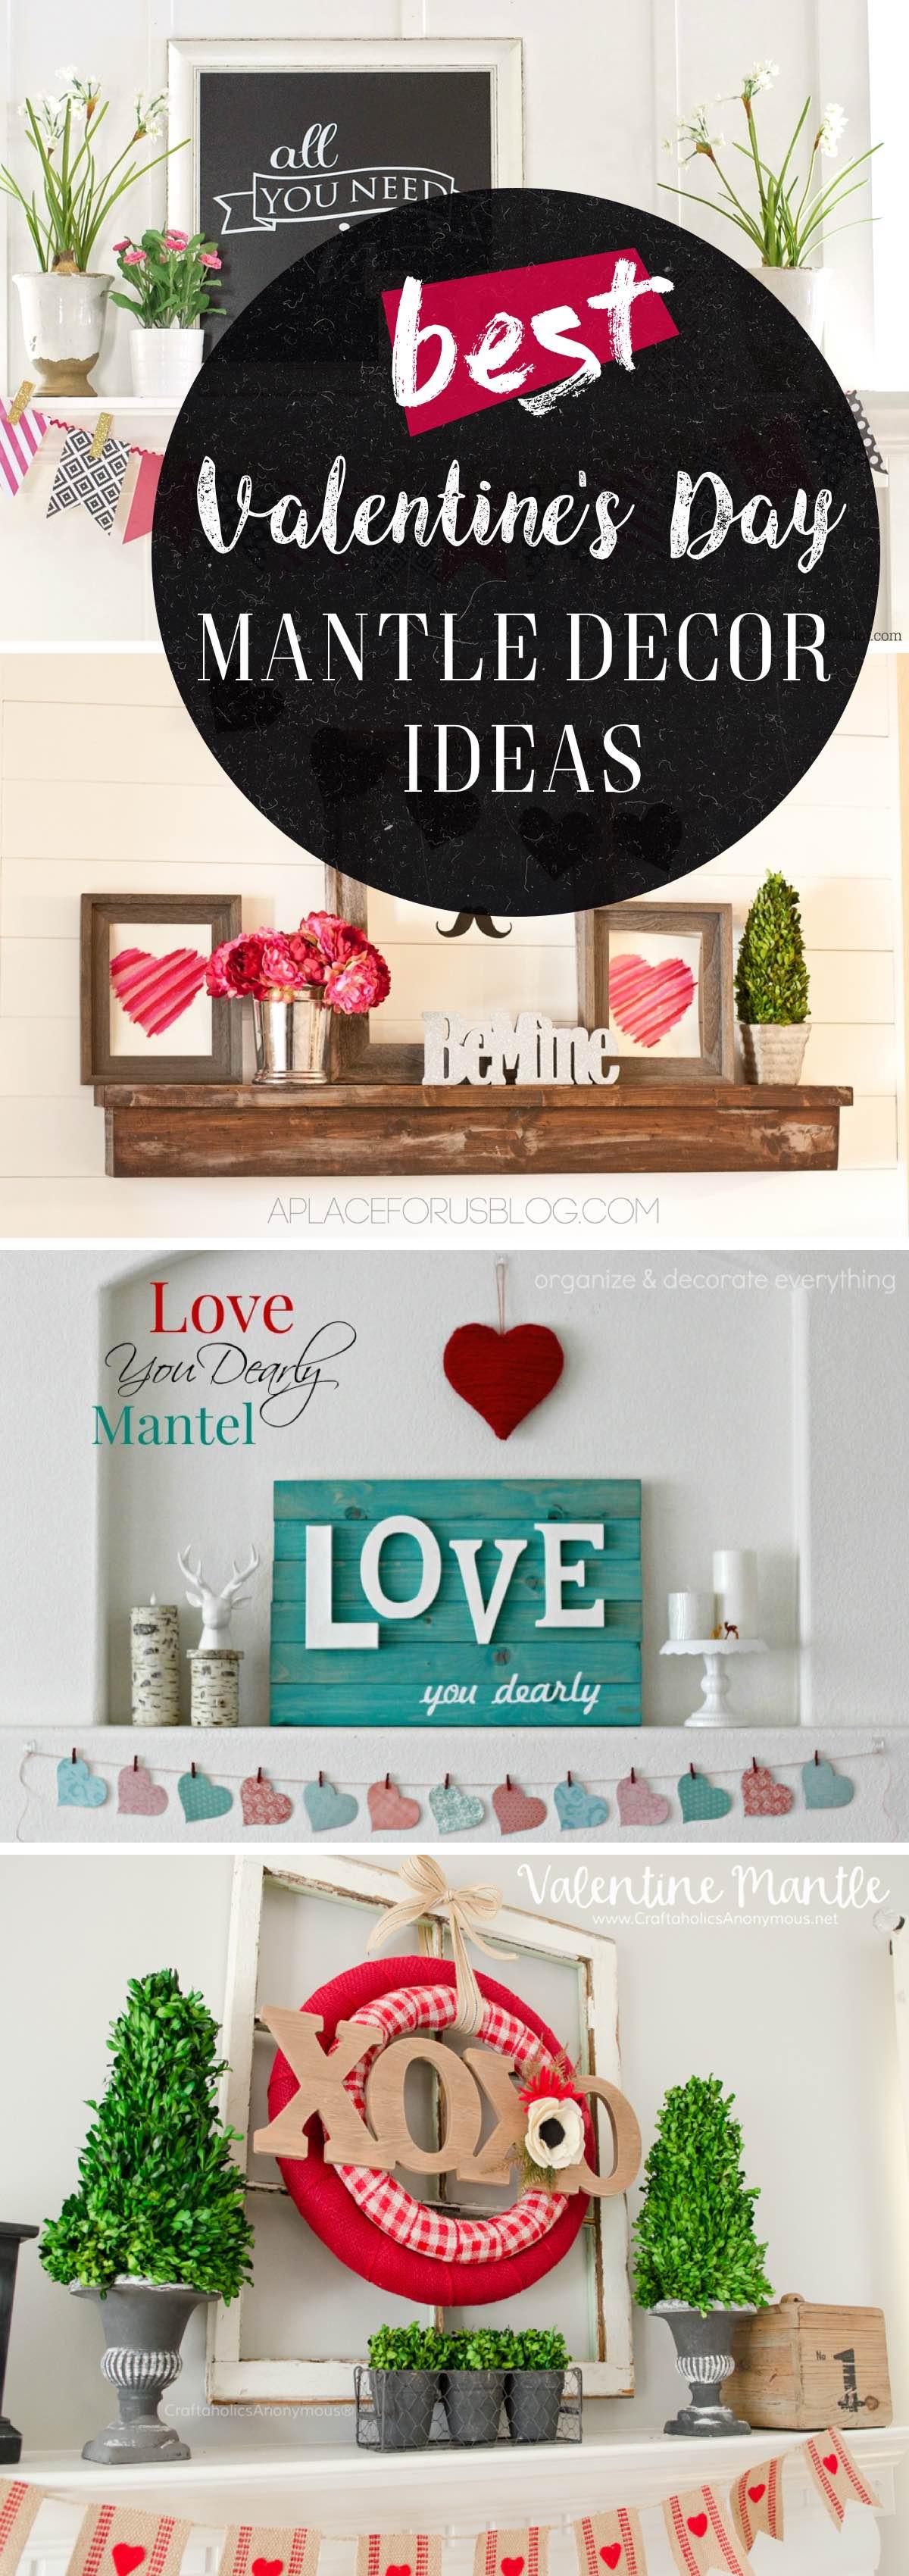 Valentines Day Mantle Decor Ideas